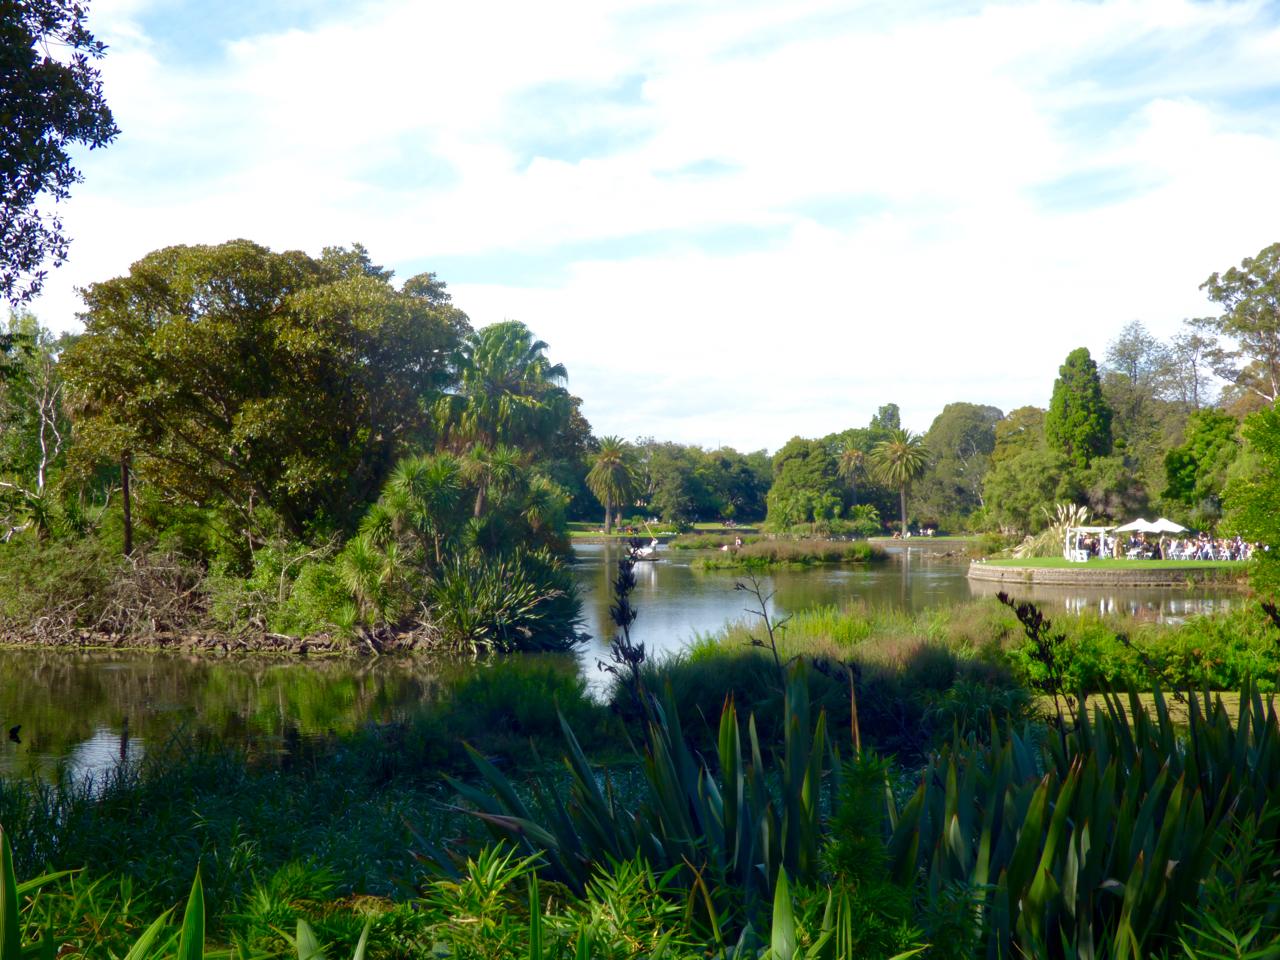 Royal Botanical Gardens Melbourne, Australia